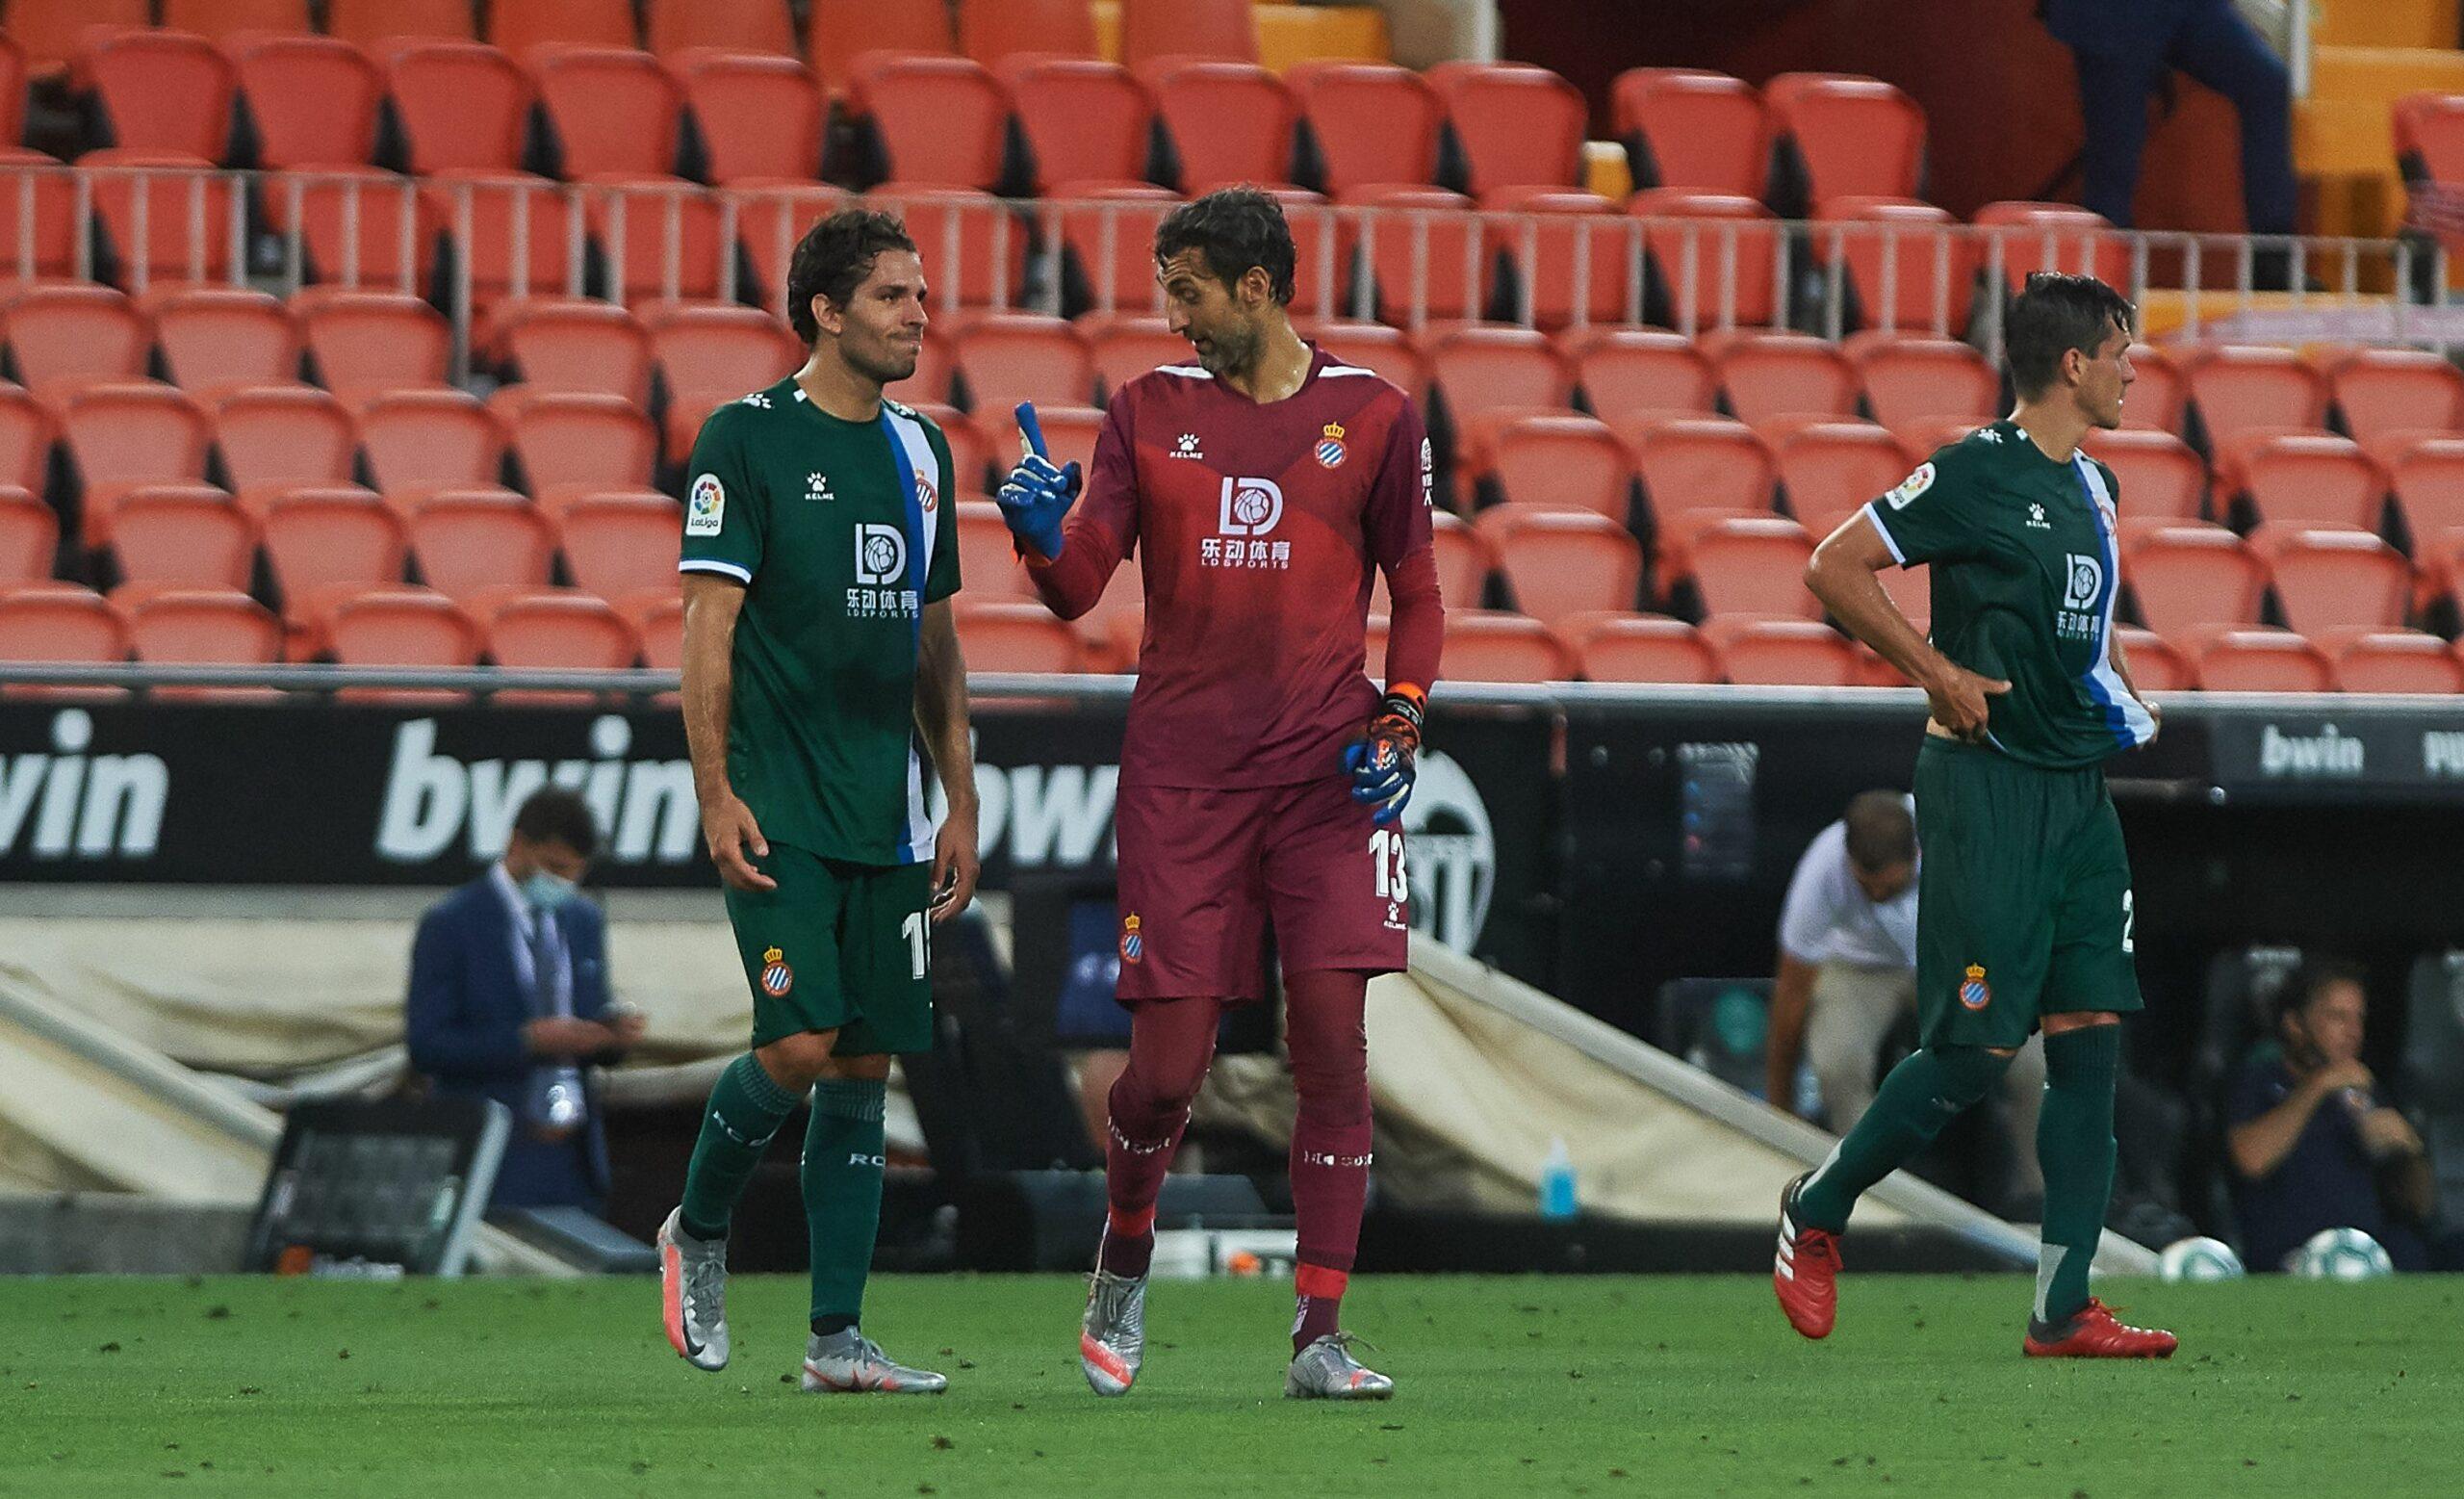 Diego López parla amb Cabrera durant el partit a Mestalla | Europa Press